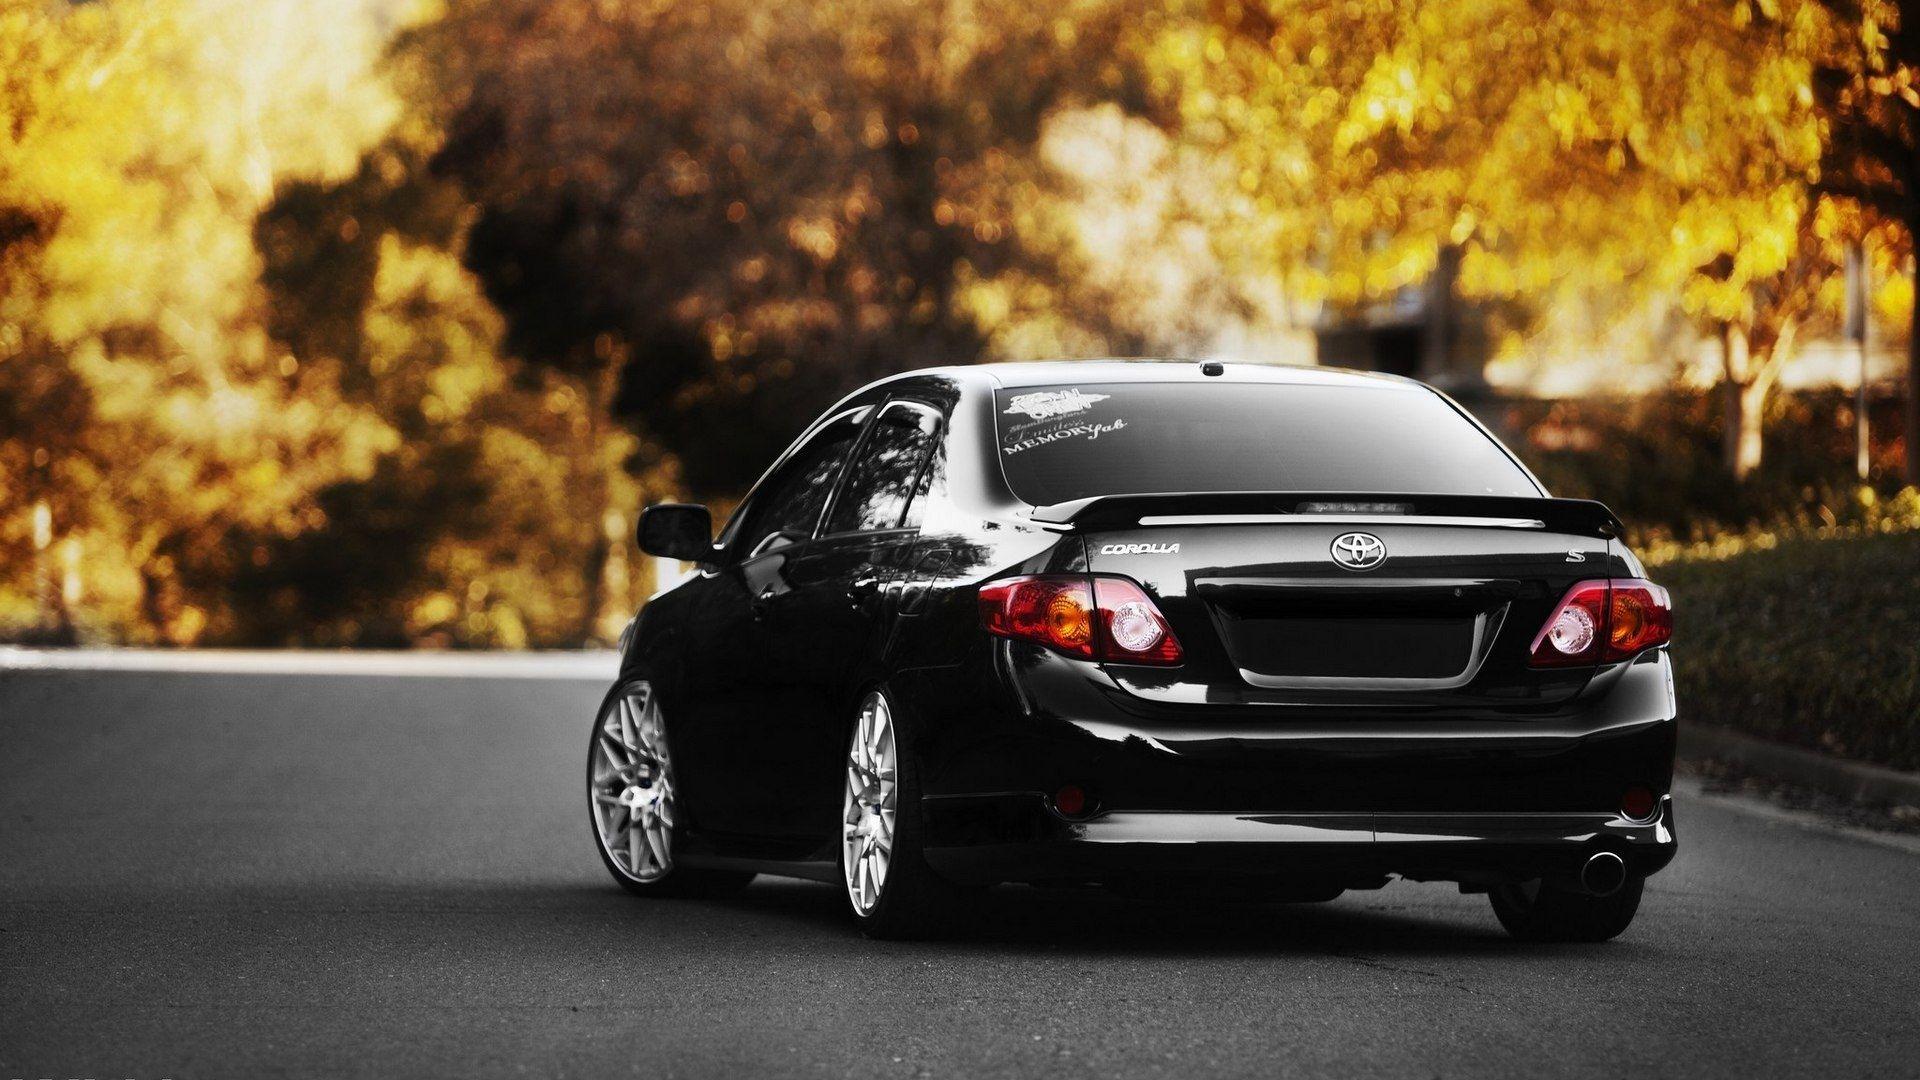 Black Toyota Carolla Back Wallpaper Gb Hd Wallpapers Back Wallpaper Car Rental Rent A Car